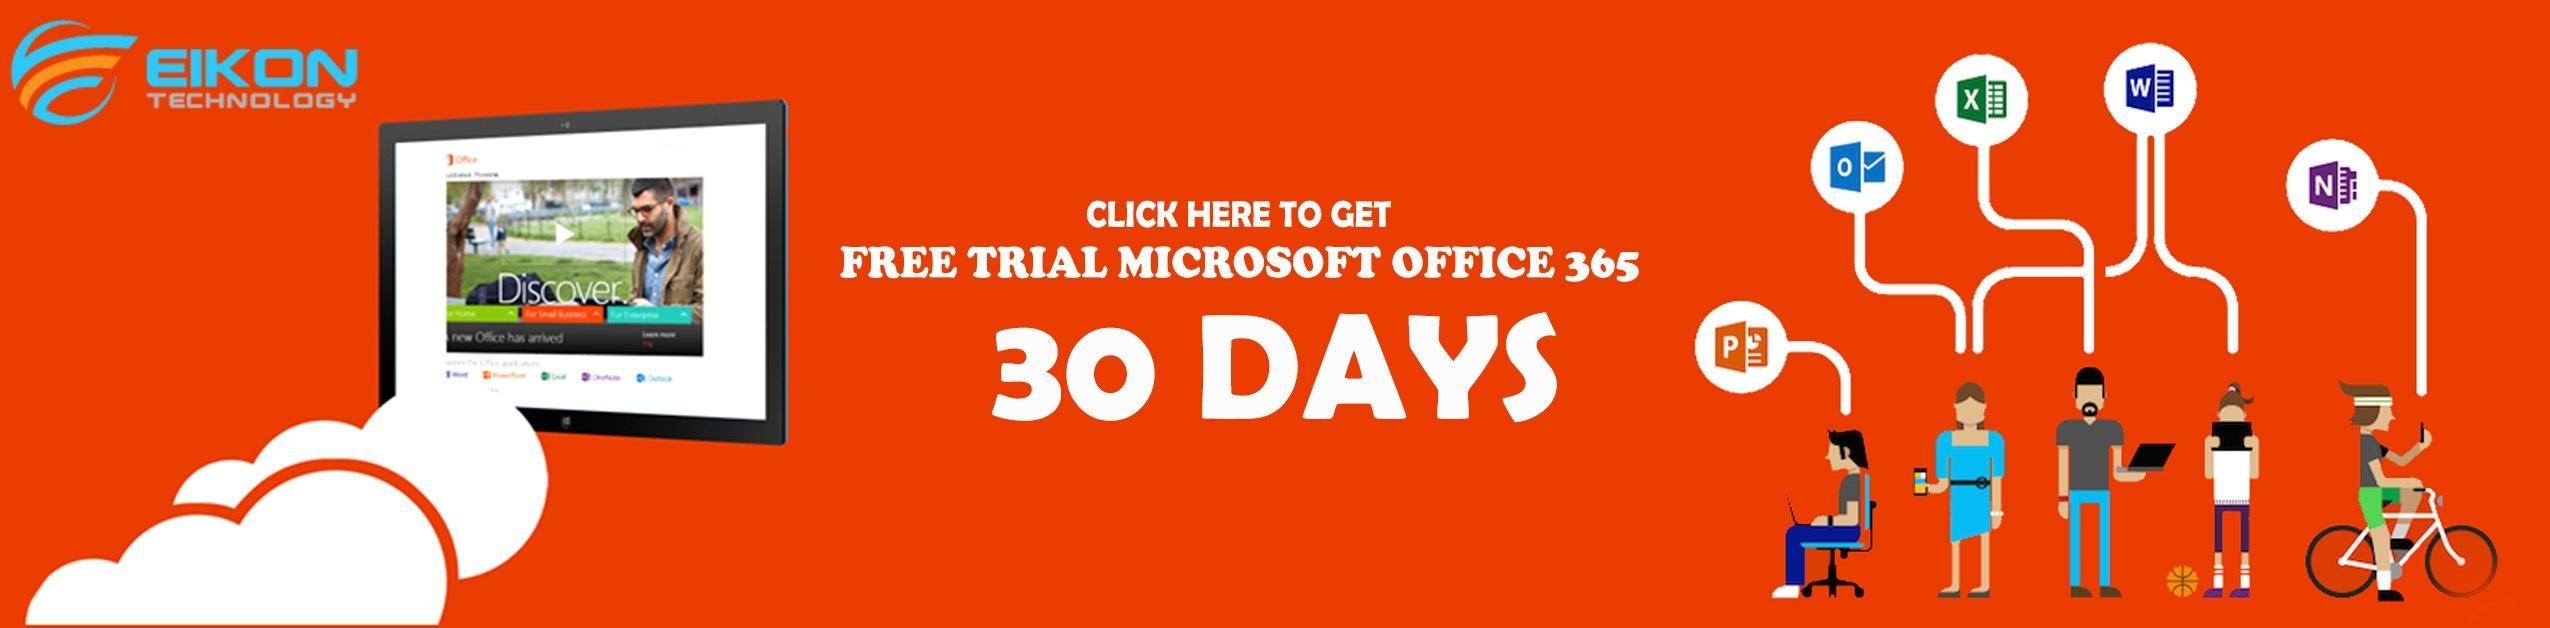 Free trial microsoft office 365 - Eikon technology